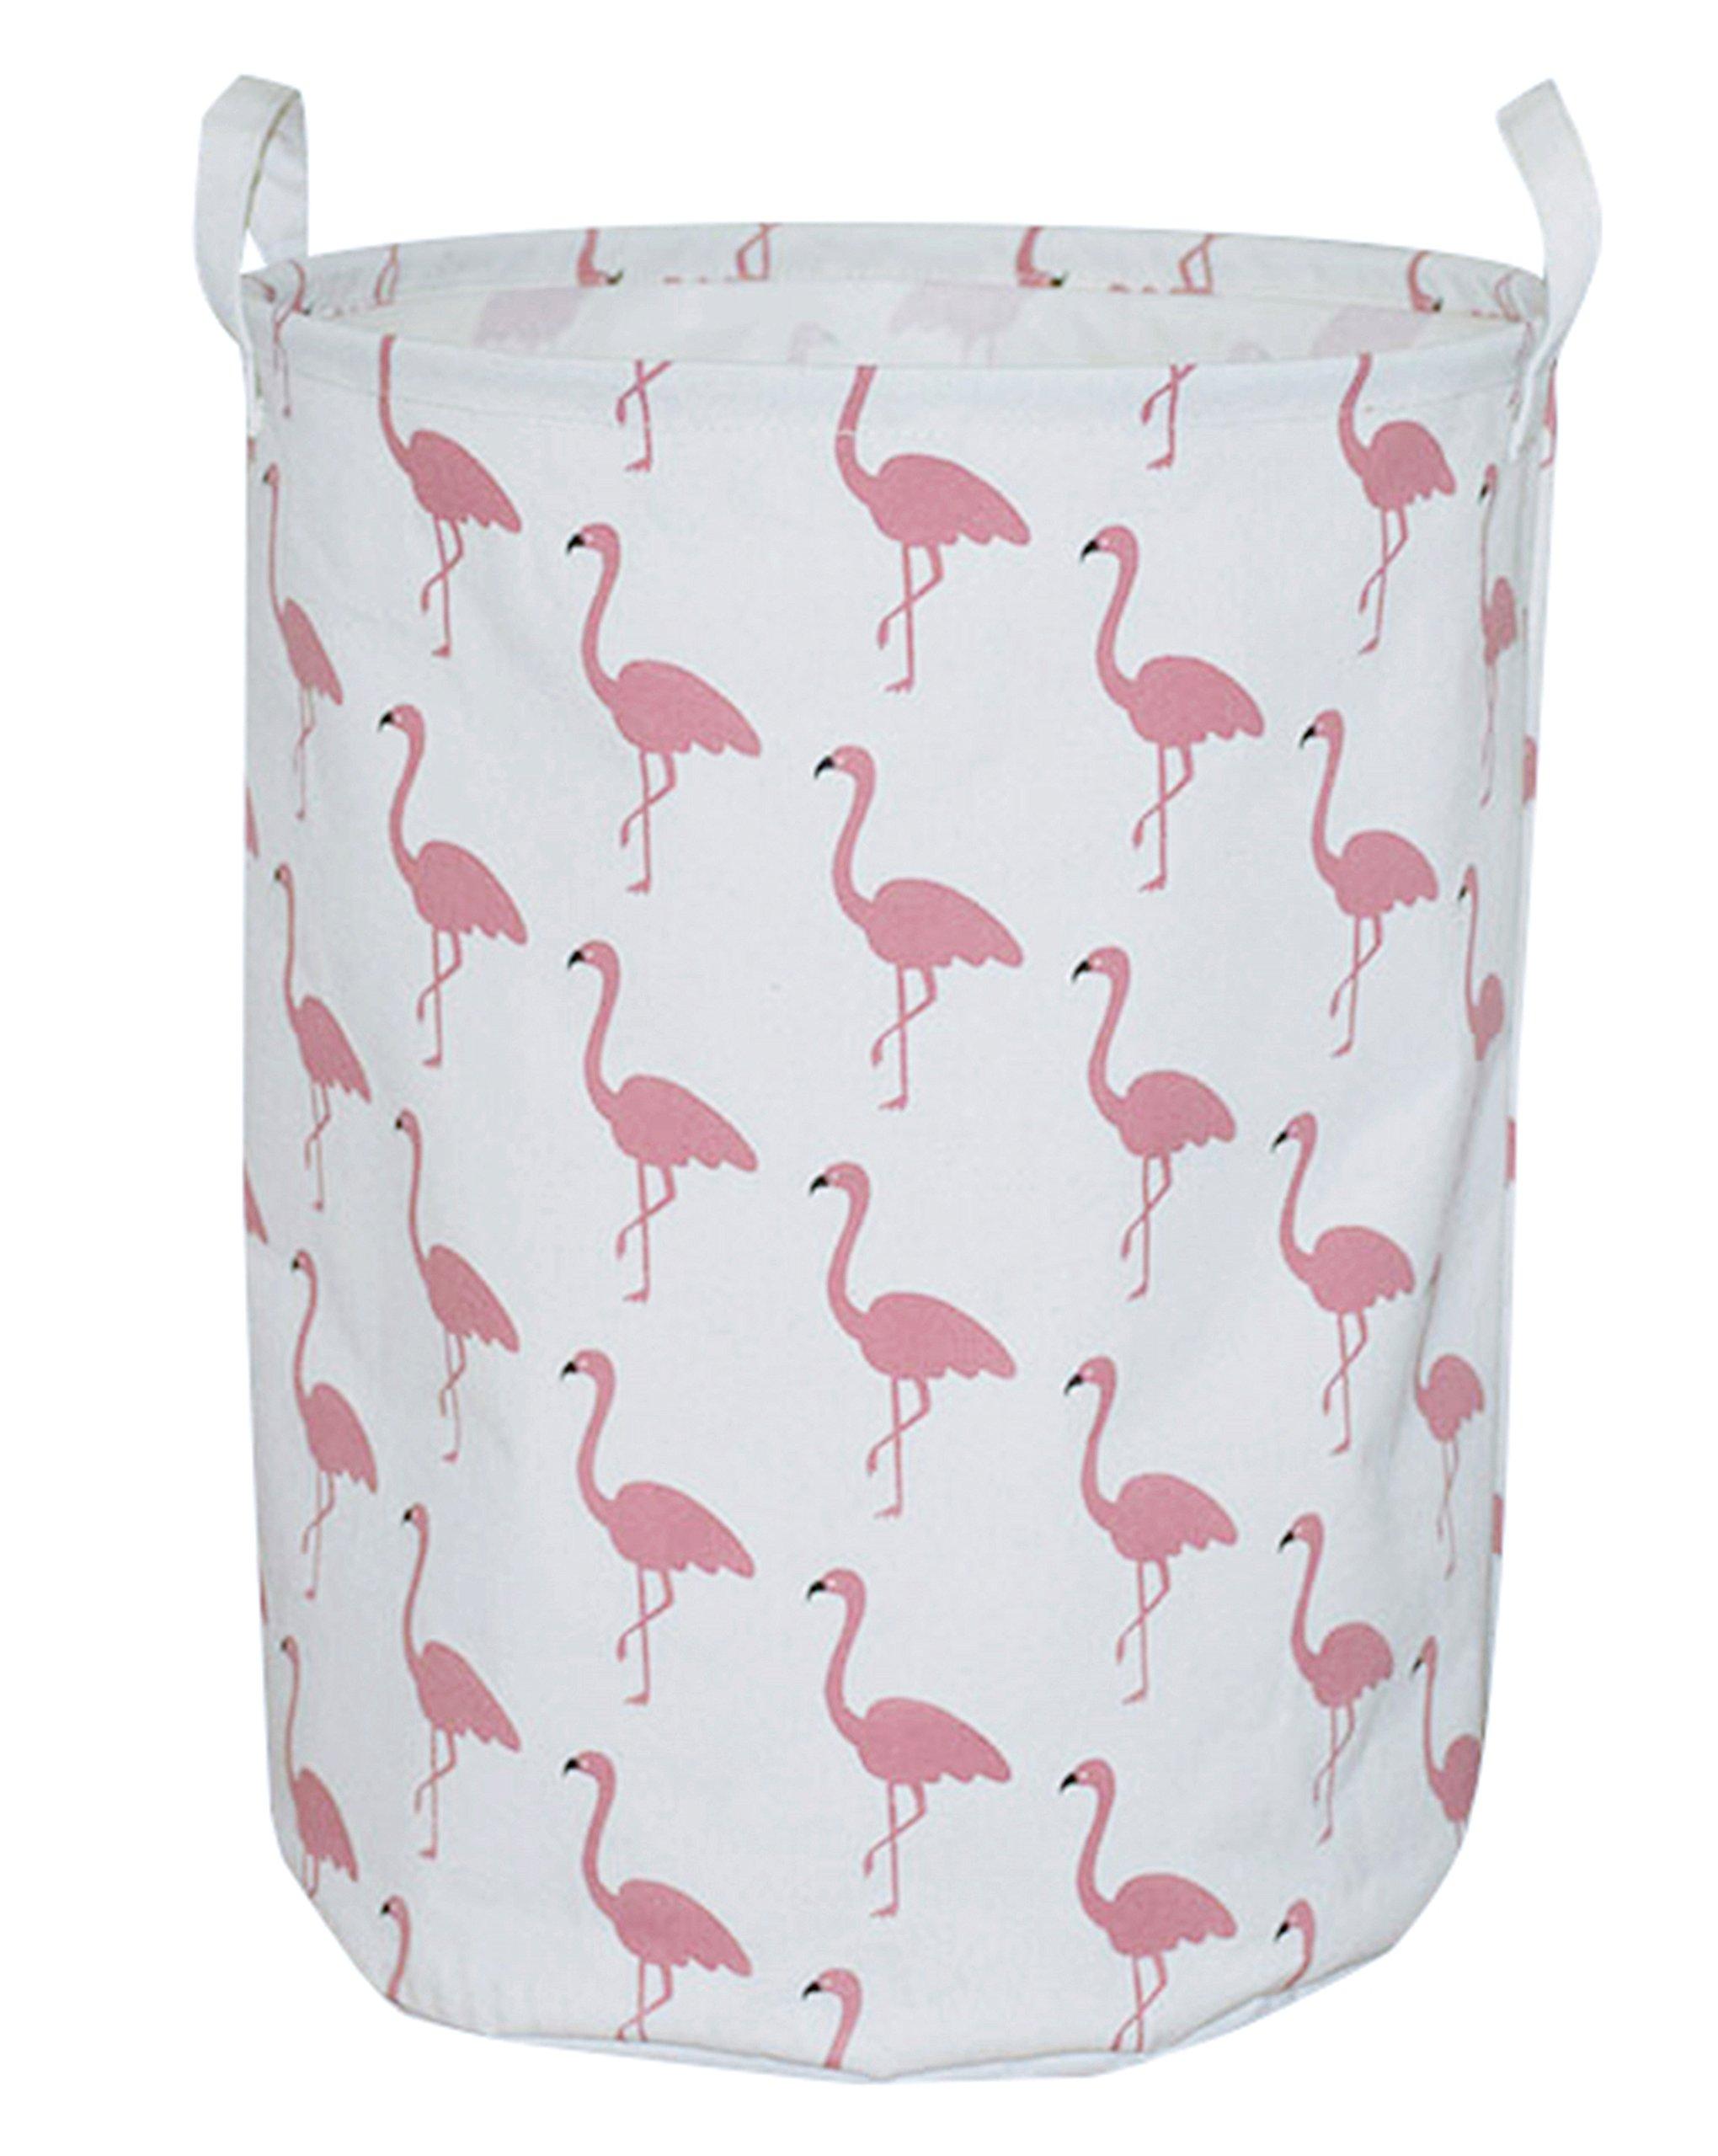 CLOCOR Large Storage Bin-Cotton storage Basket-Round Gift Basket with Handles for Toys,Laundry Storage (White flamingo)